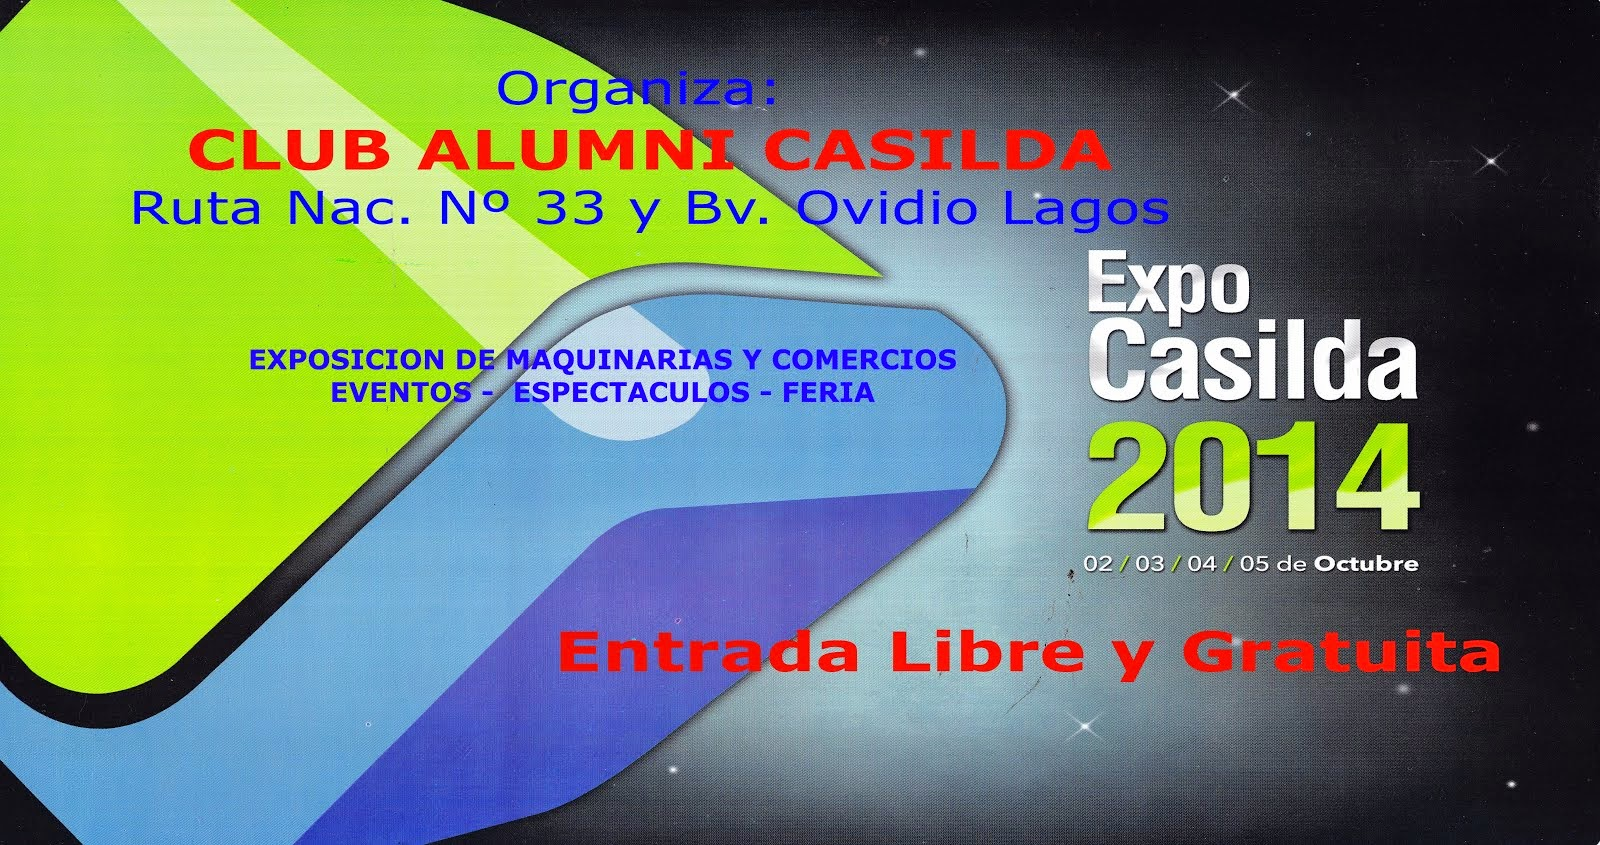 EXPO CASILDA 2014